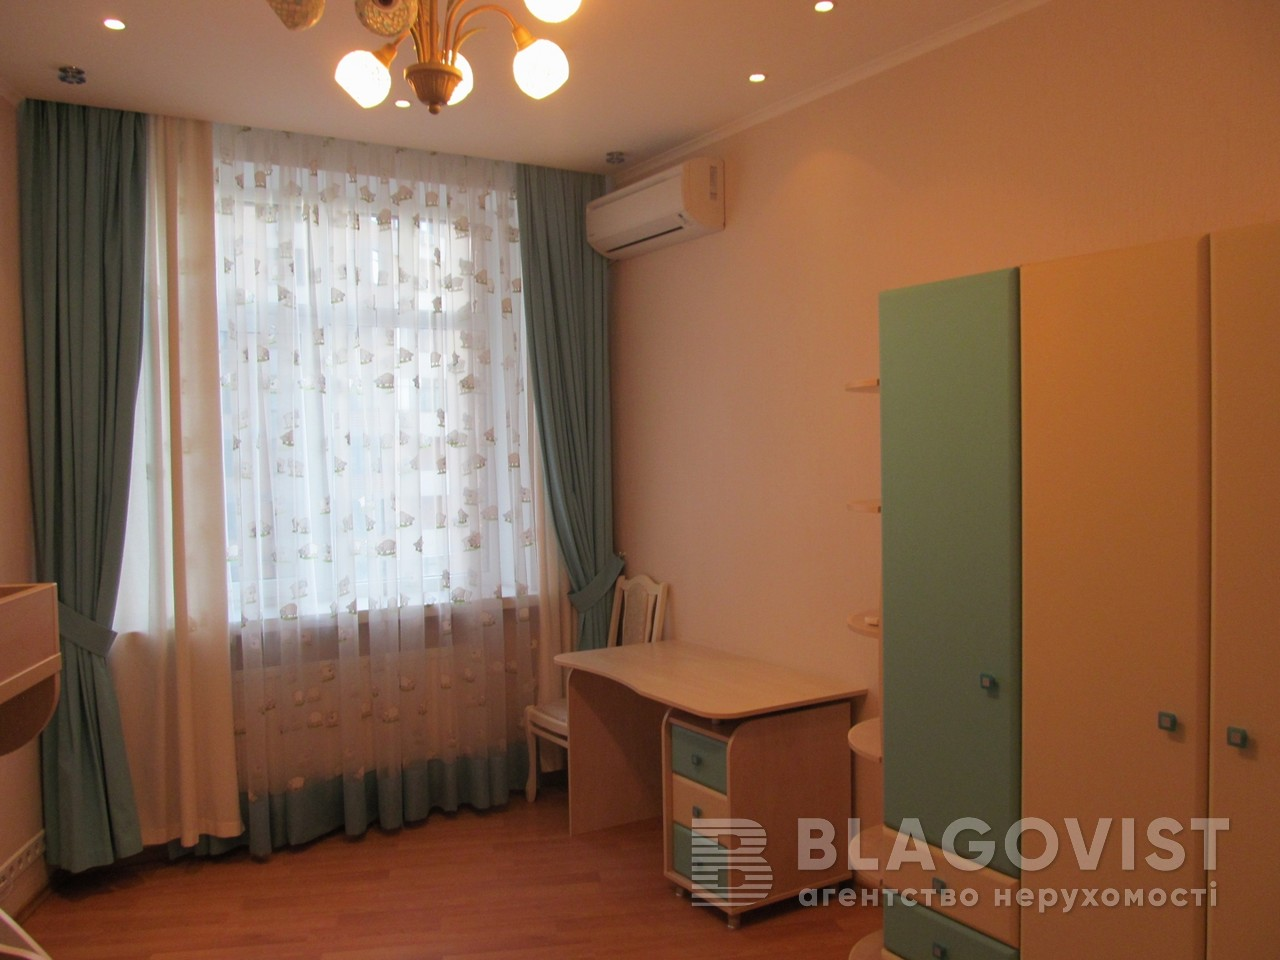 Квартира C-100029, Старонаводницкая, 6б, Киев - Фото 15